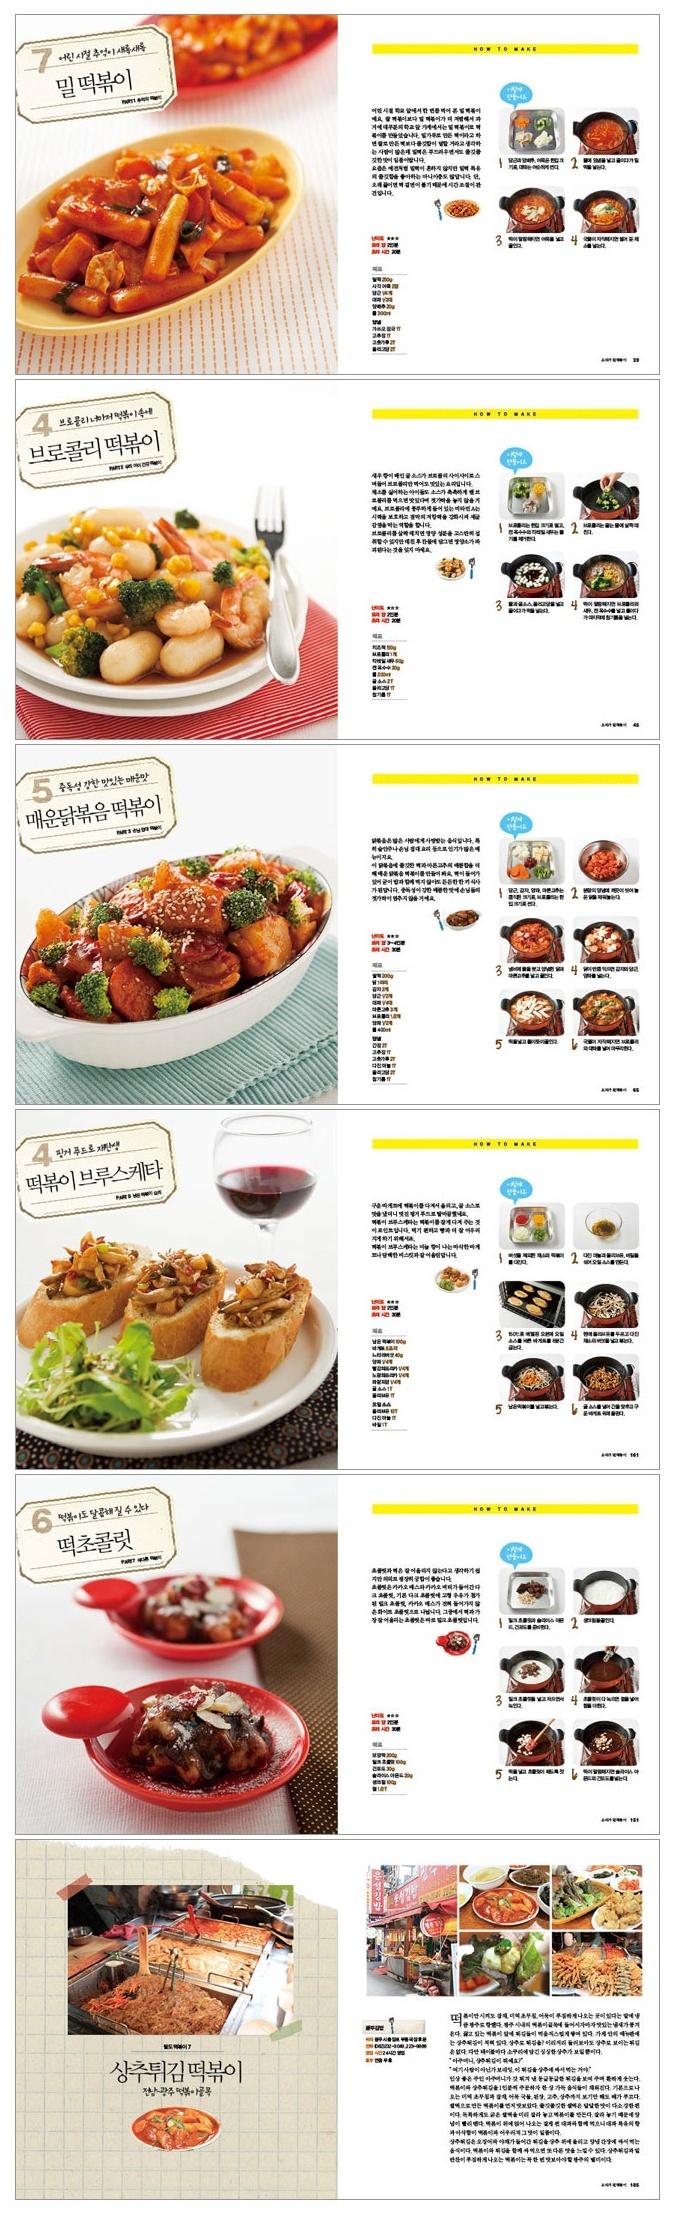 37 best korean food images on pinterest graphics posters and kitchens korean book tteokbokki became cook 1315 on kstargoods the best korea online forumfinder Image collections